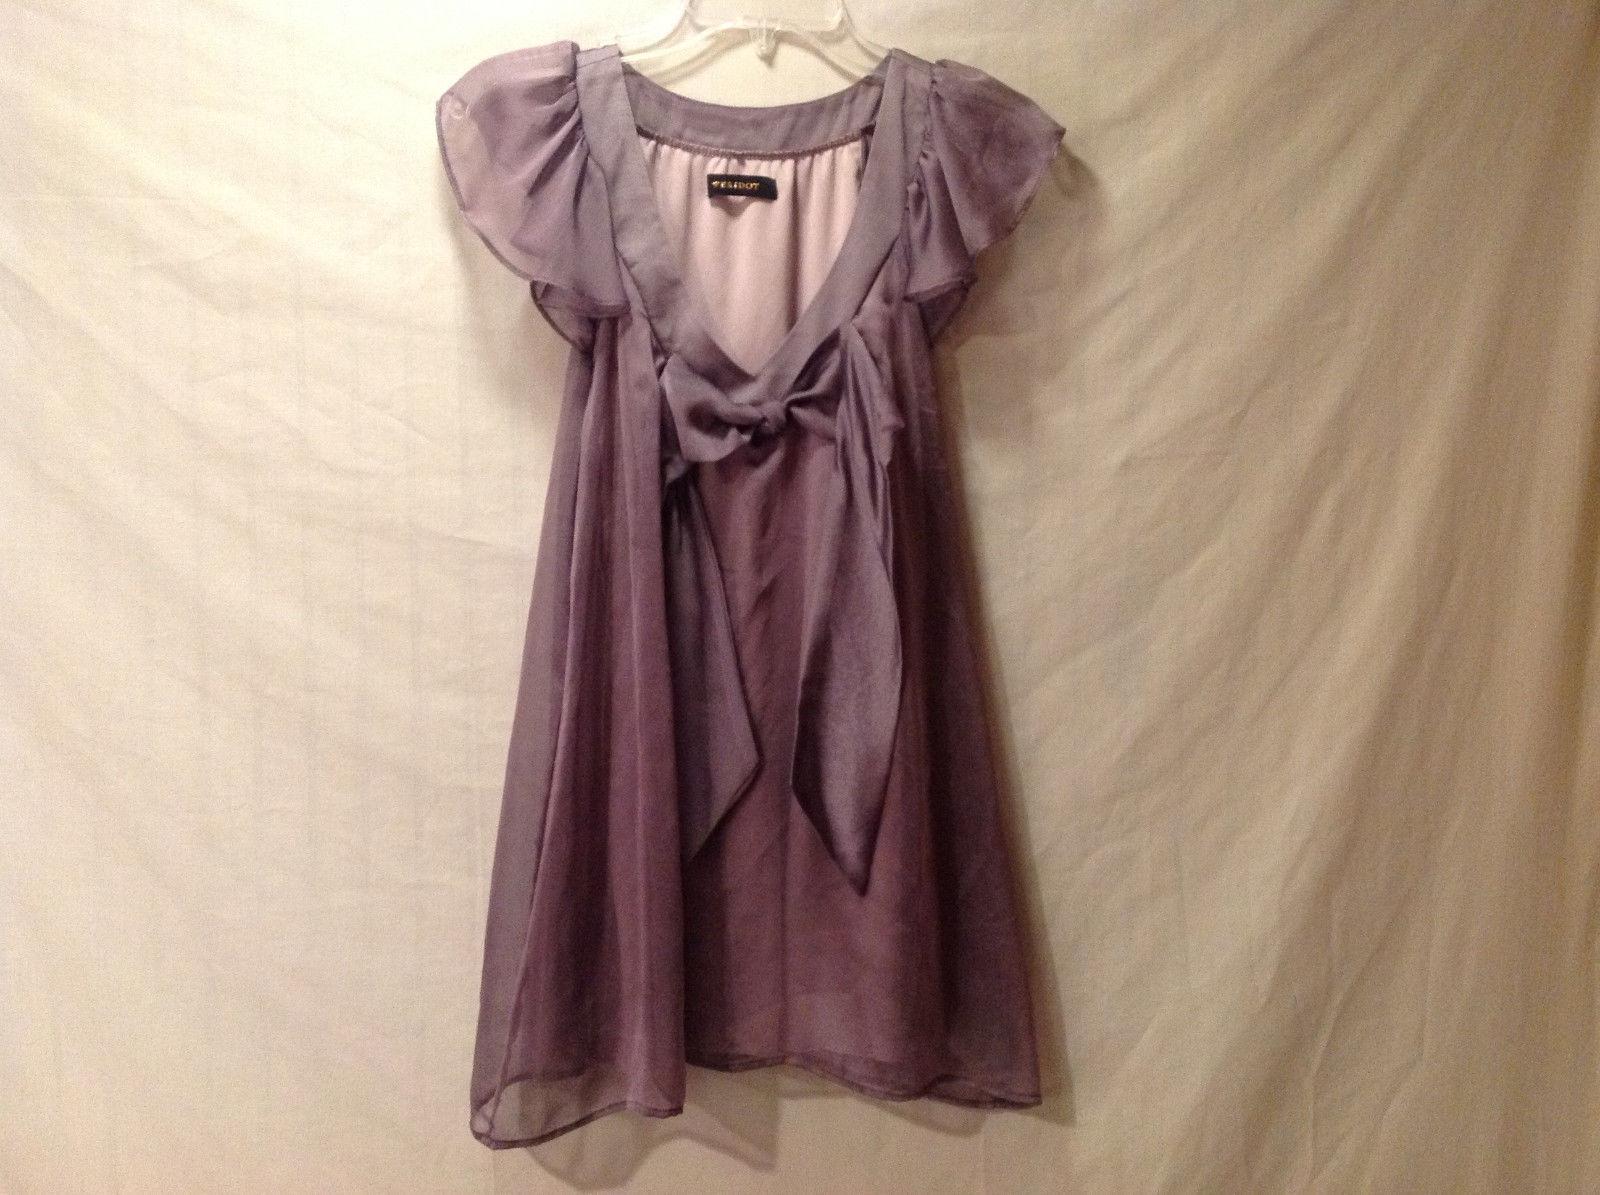 Peridot Women's Size L Babydoll Top Dusty Mauve w/ Ruffle V Neck & Bow Sash Tie